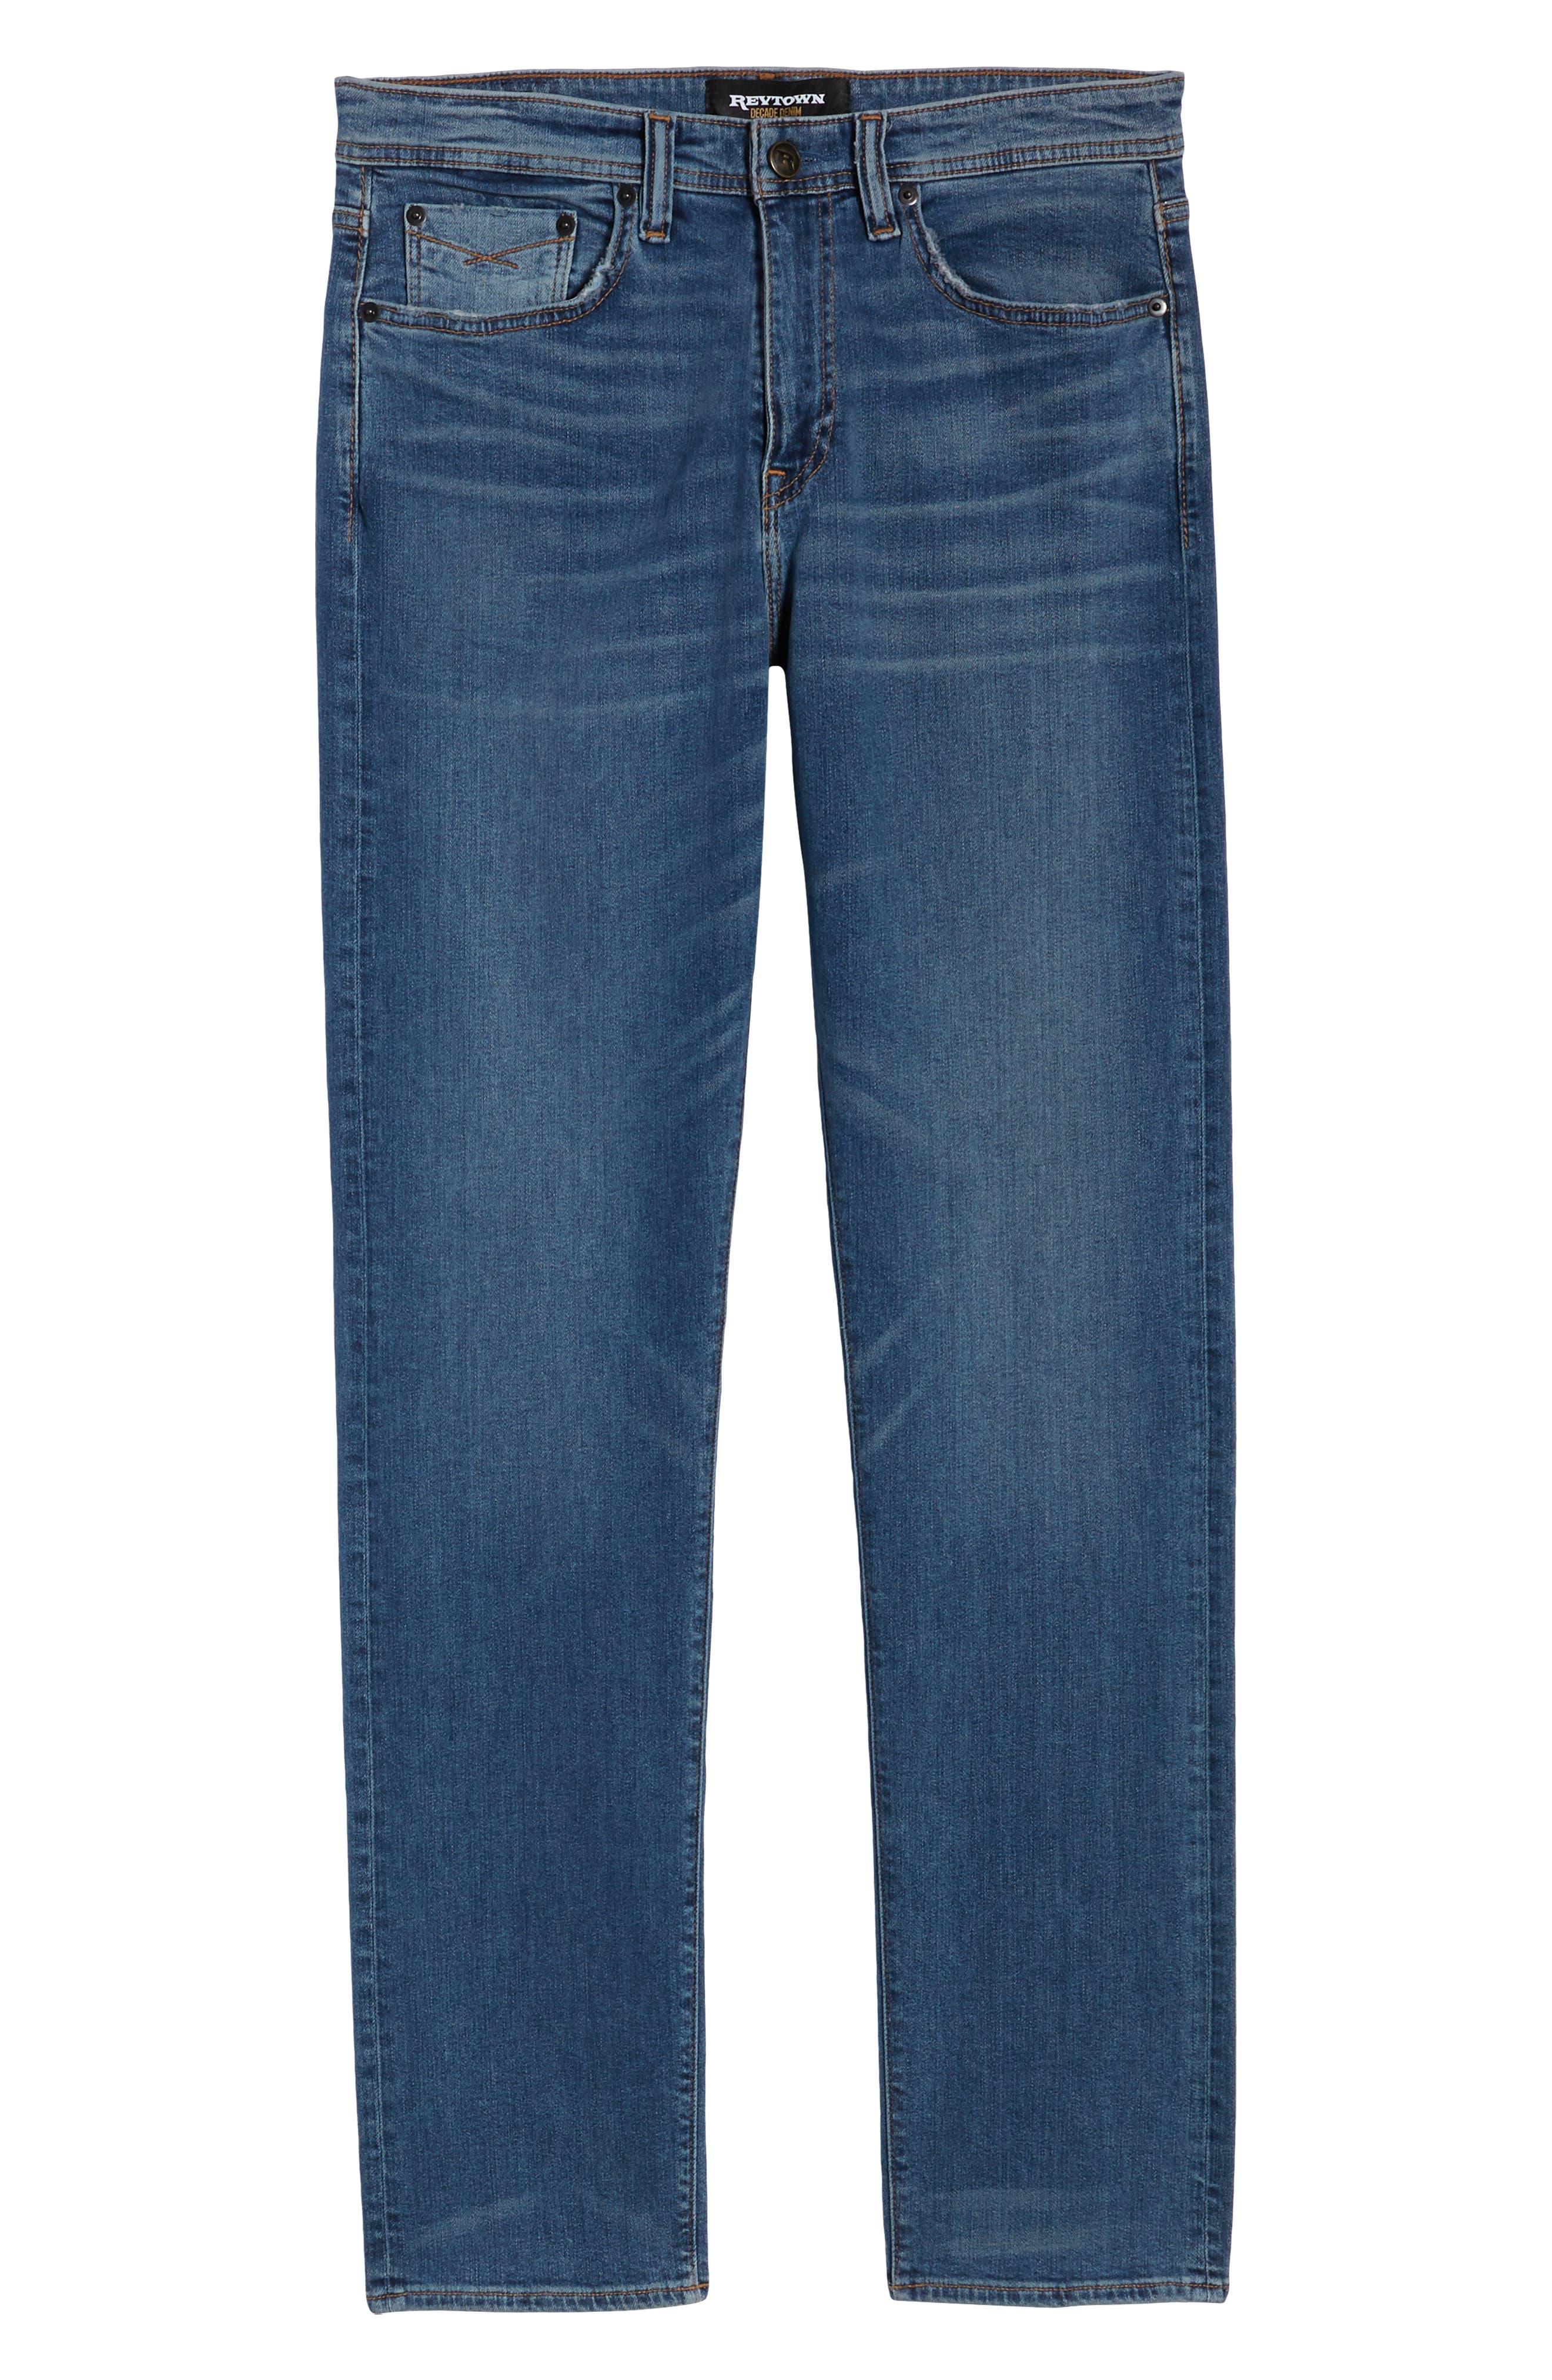 Automatic Straight Leg Jeans,                             Alternate thumbnail 6, color,                             FADED INDIGO